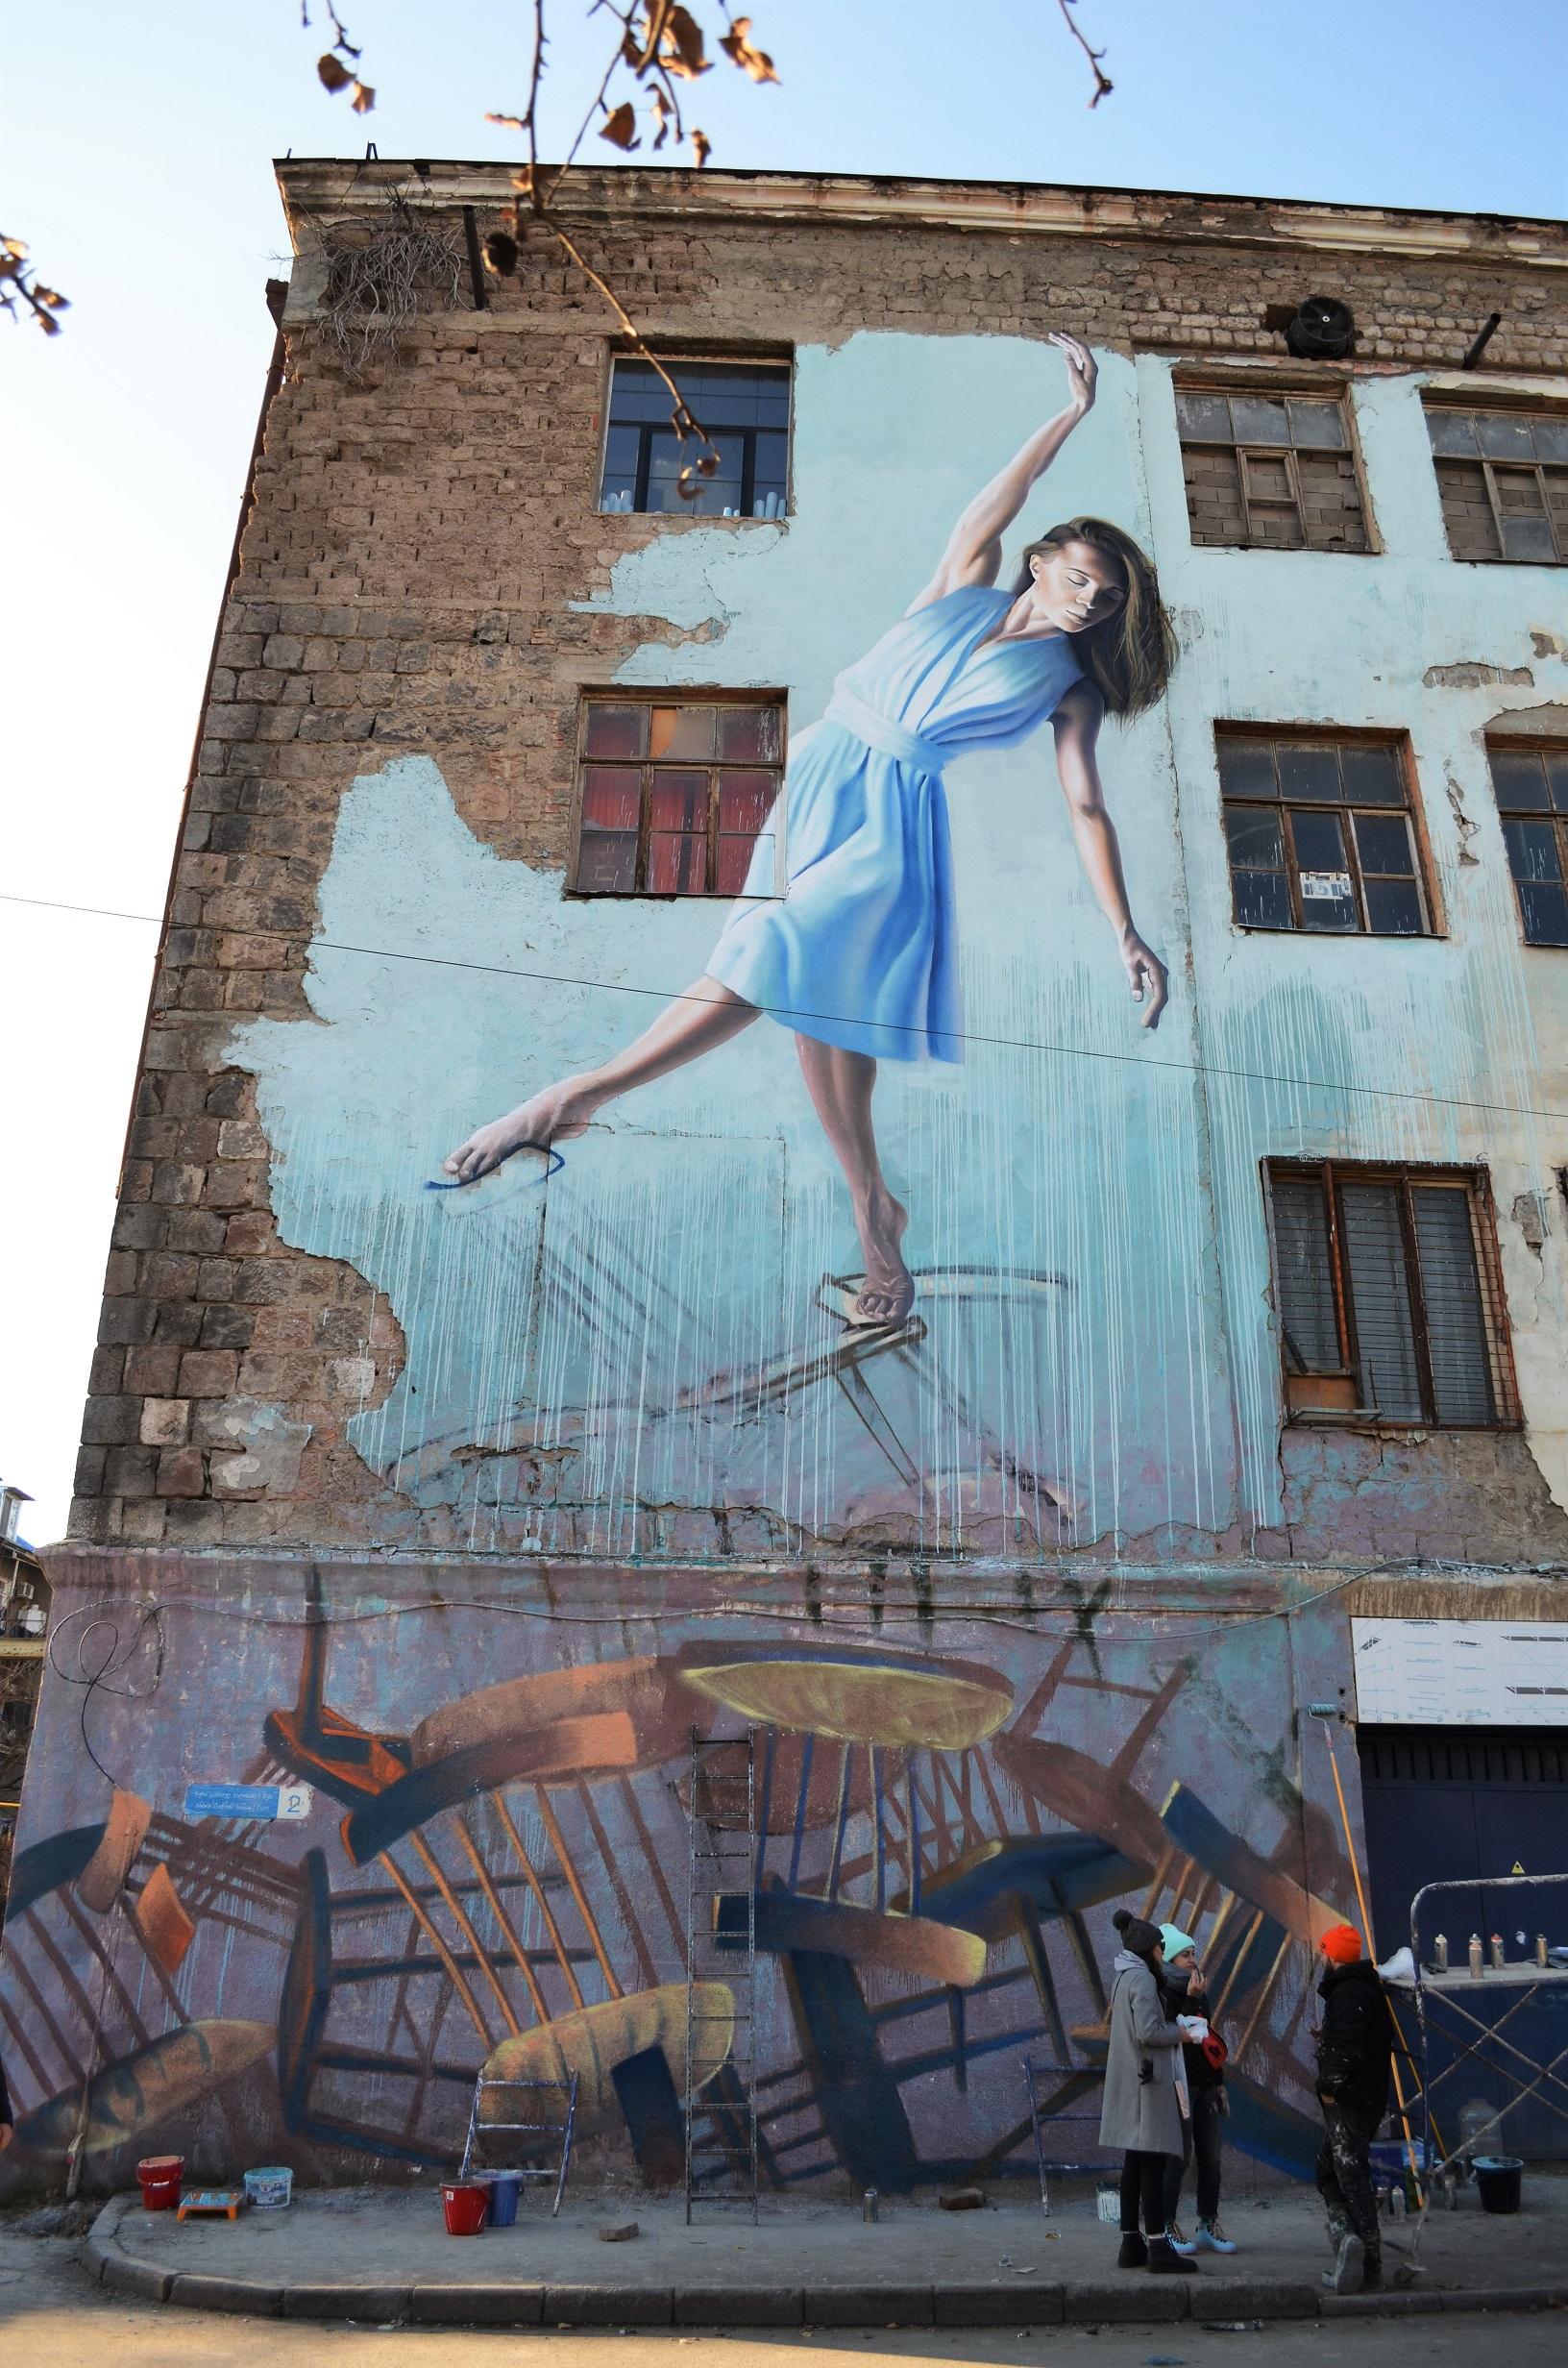 6 #art featured, арт, Бразилия, германия, граффити, Грузия, Дино Бенто, искусство, Лапиз, мурал, Саша Корбан, стрит-арт, тбилиси, украина